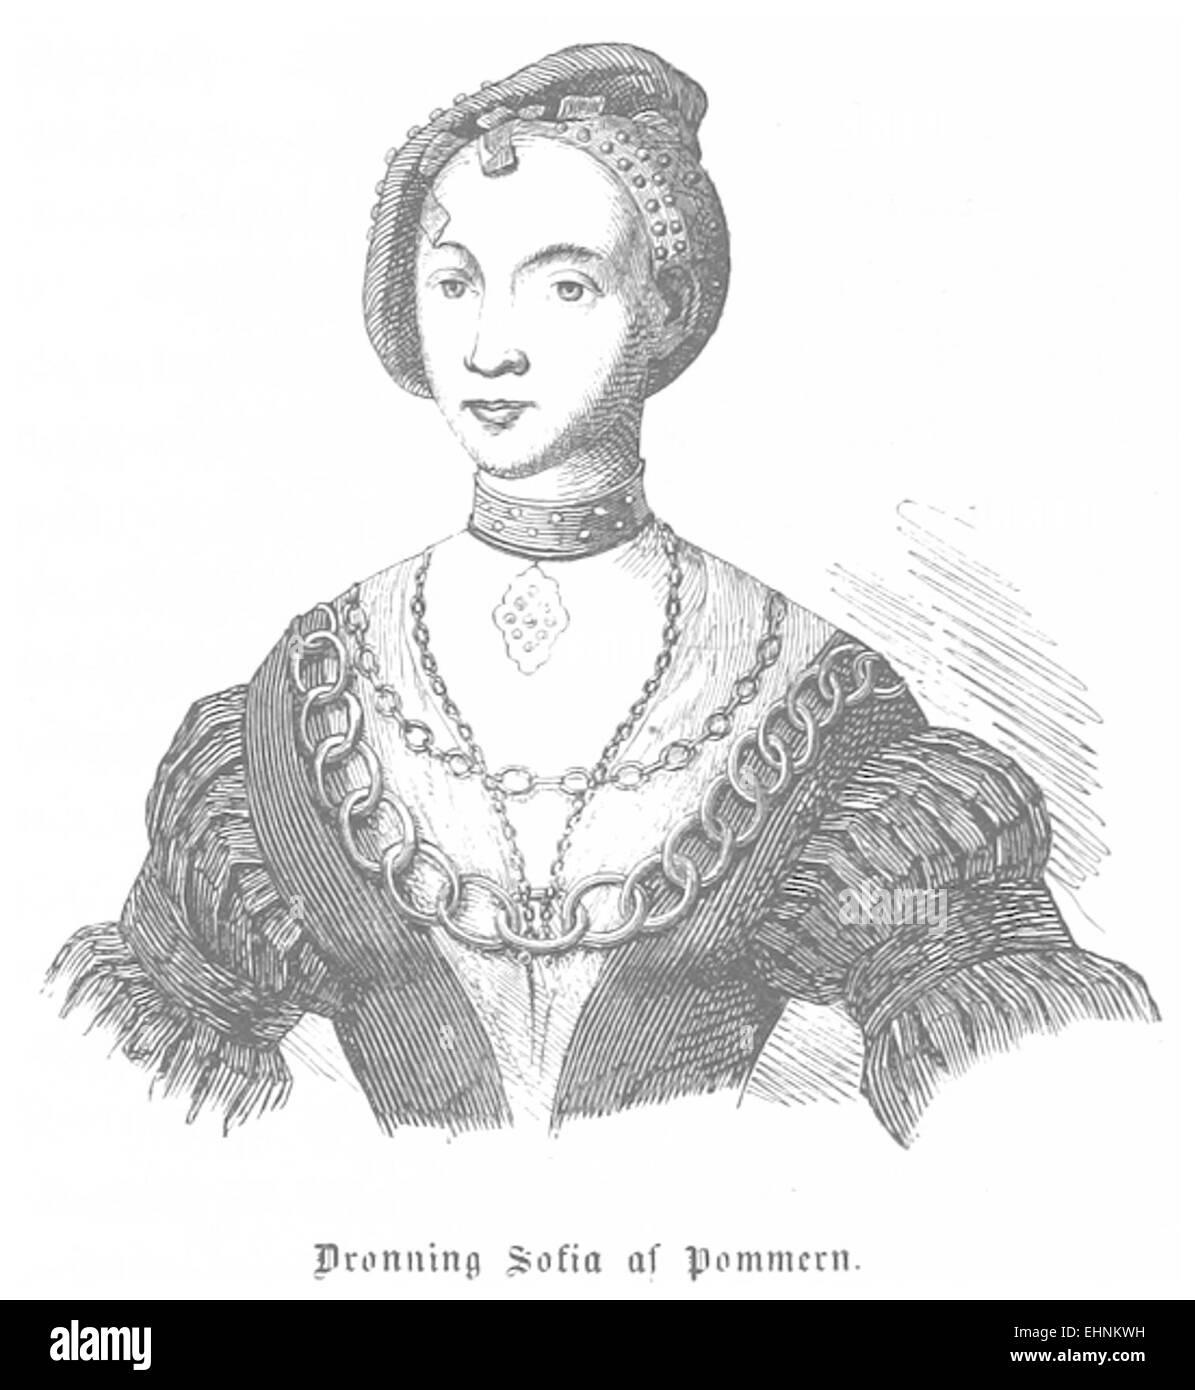 J.H.(1856) Denmark, p028 Sofia Stock Photo